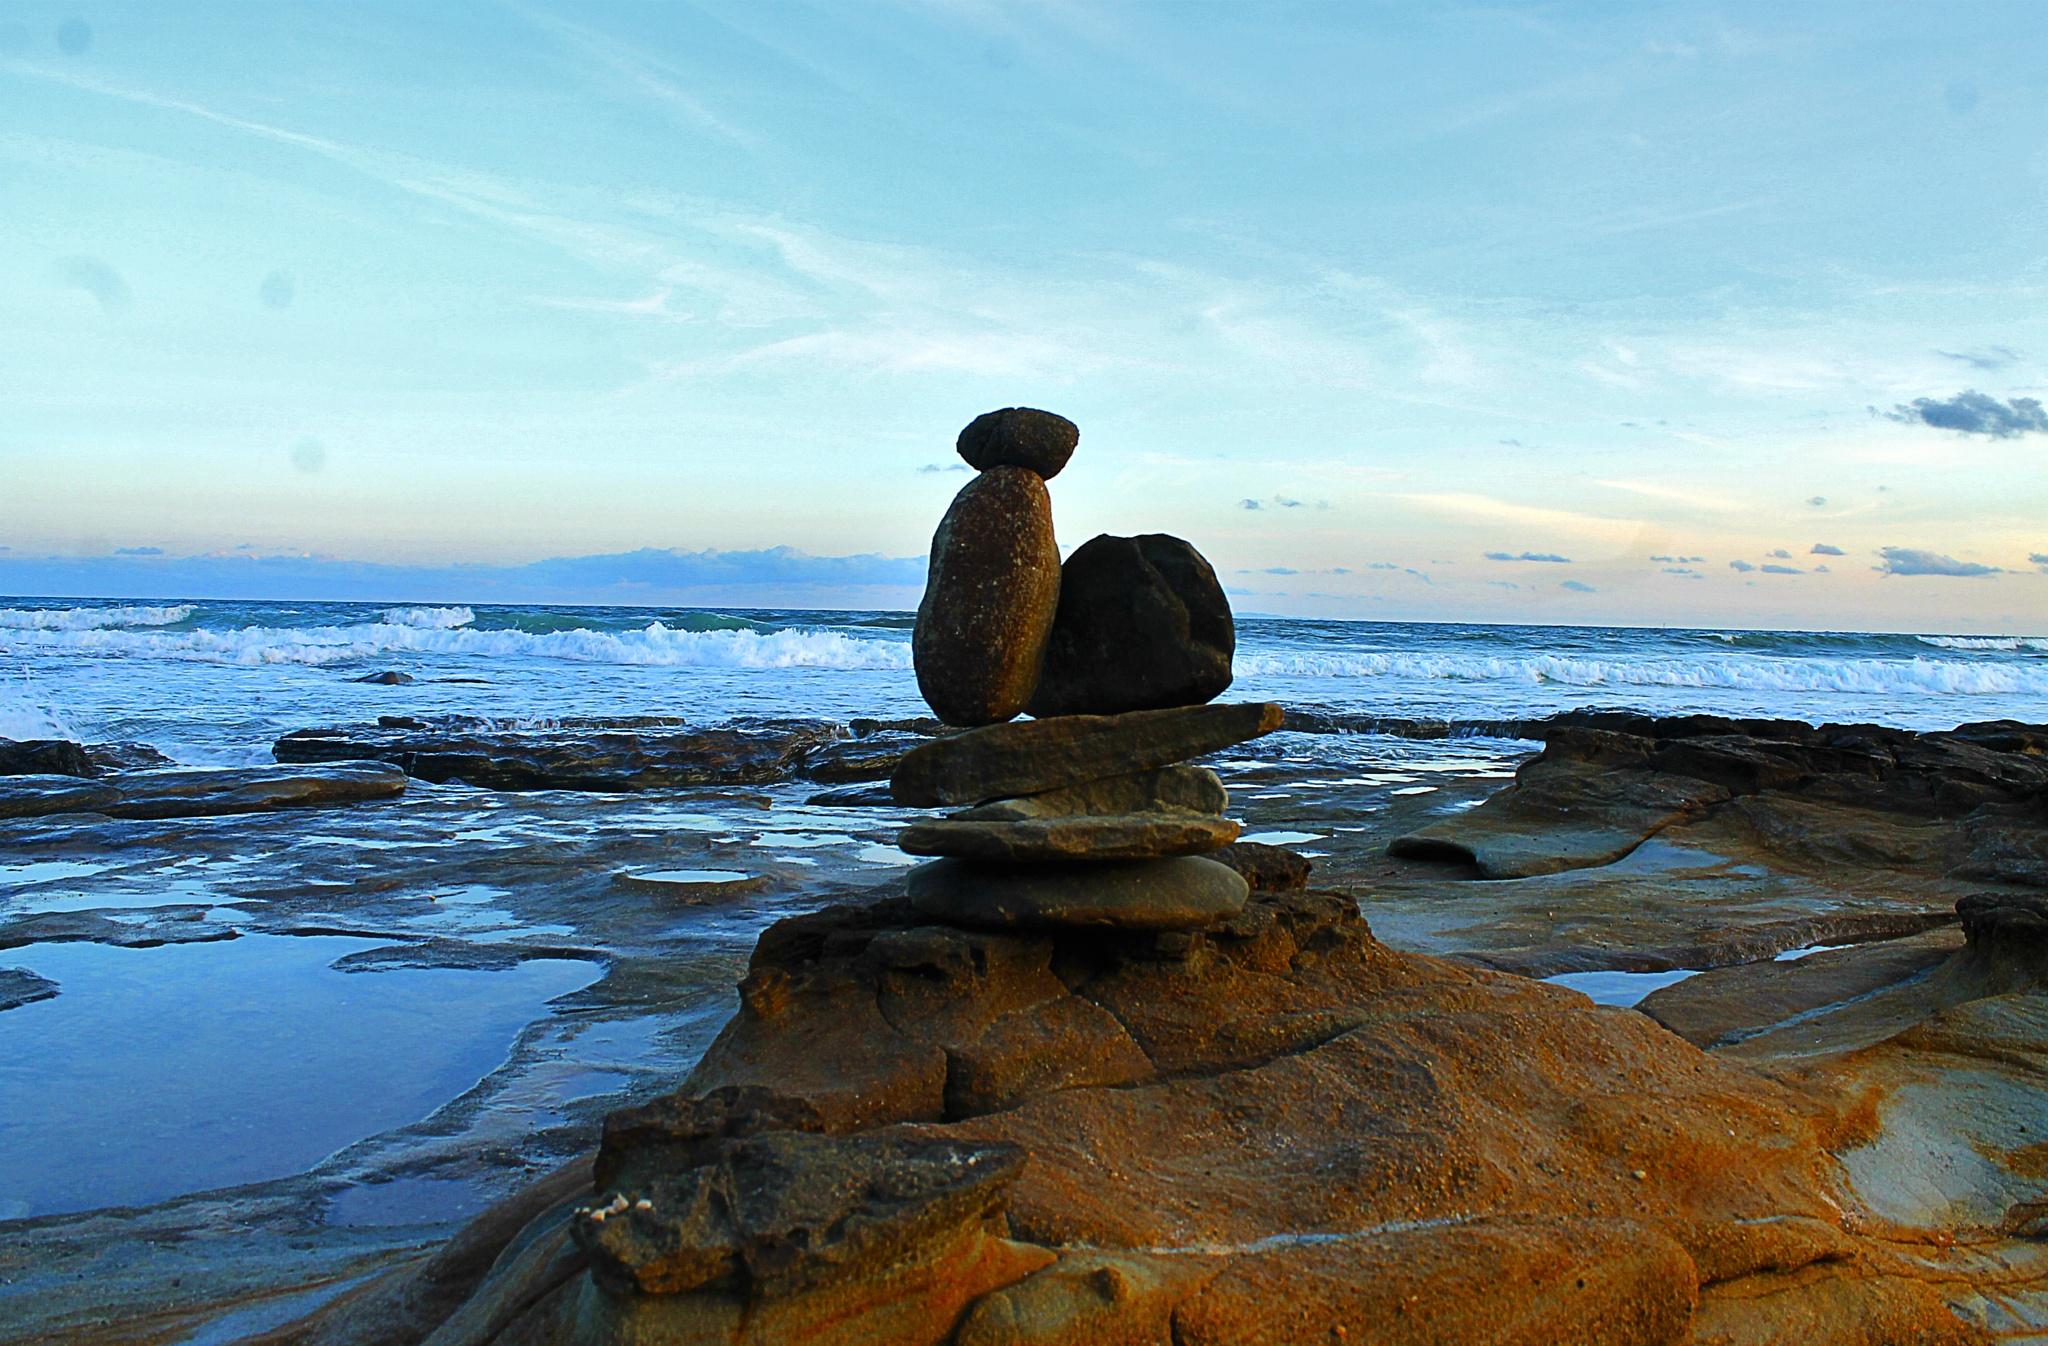 Rocks by the sea by Sarah Black